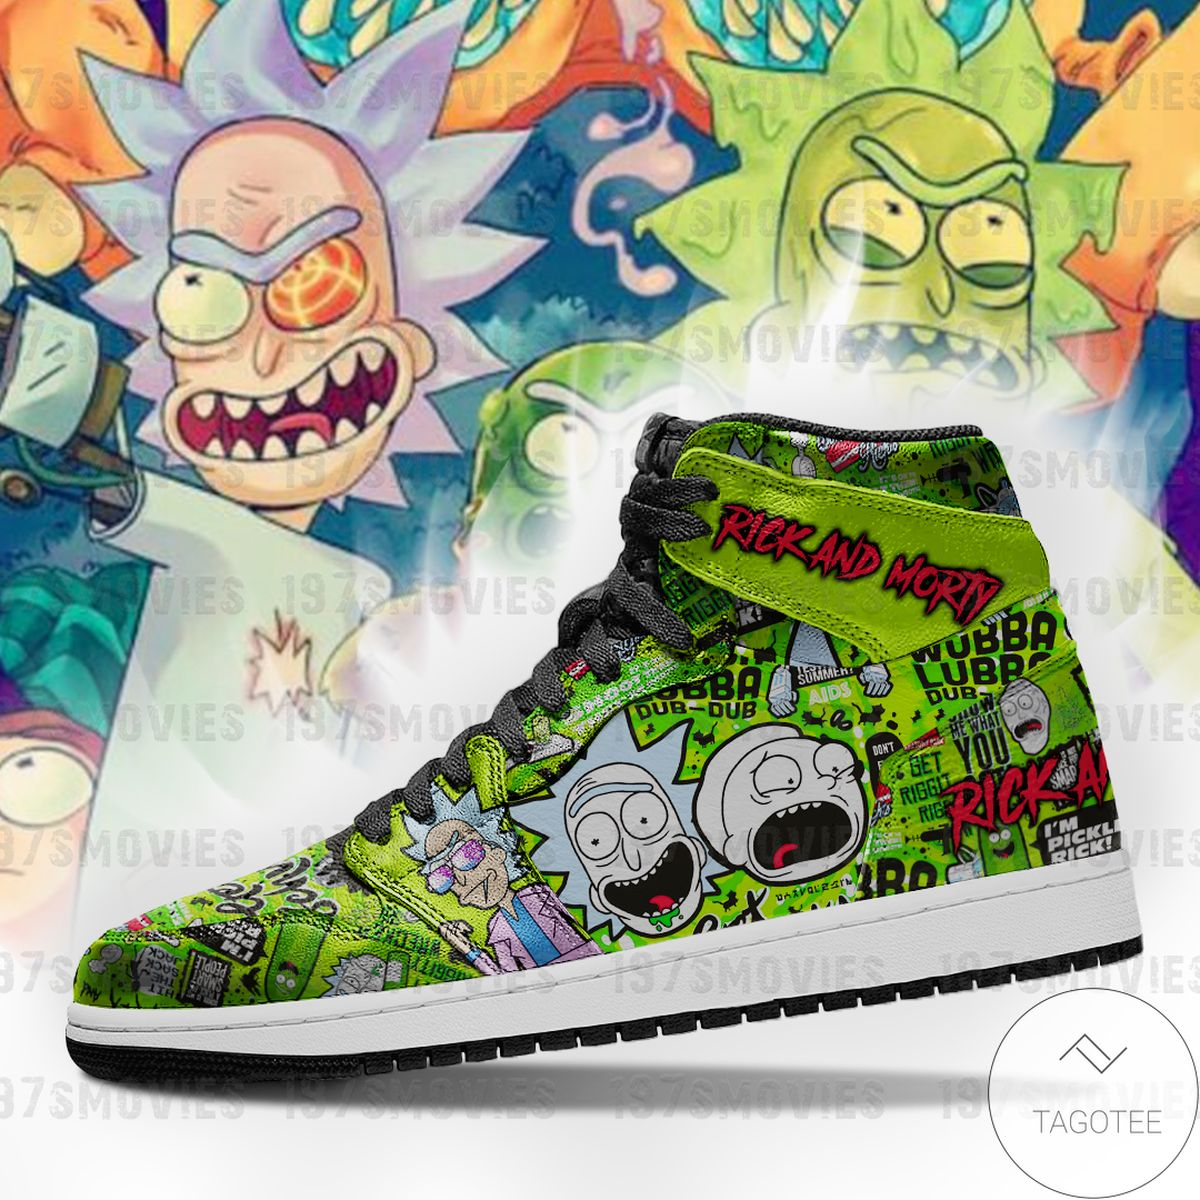 Top Rated Rick and Morty Sneaker Air Jordan High Top Shoes